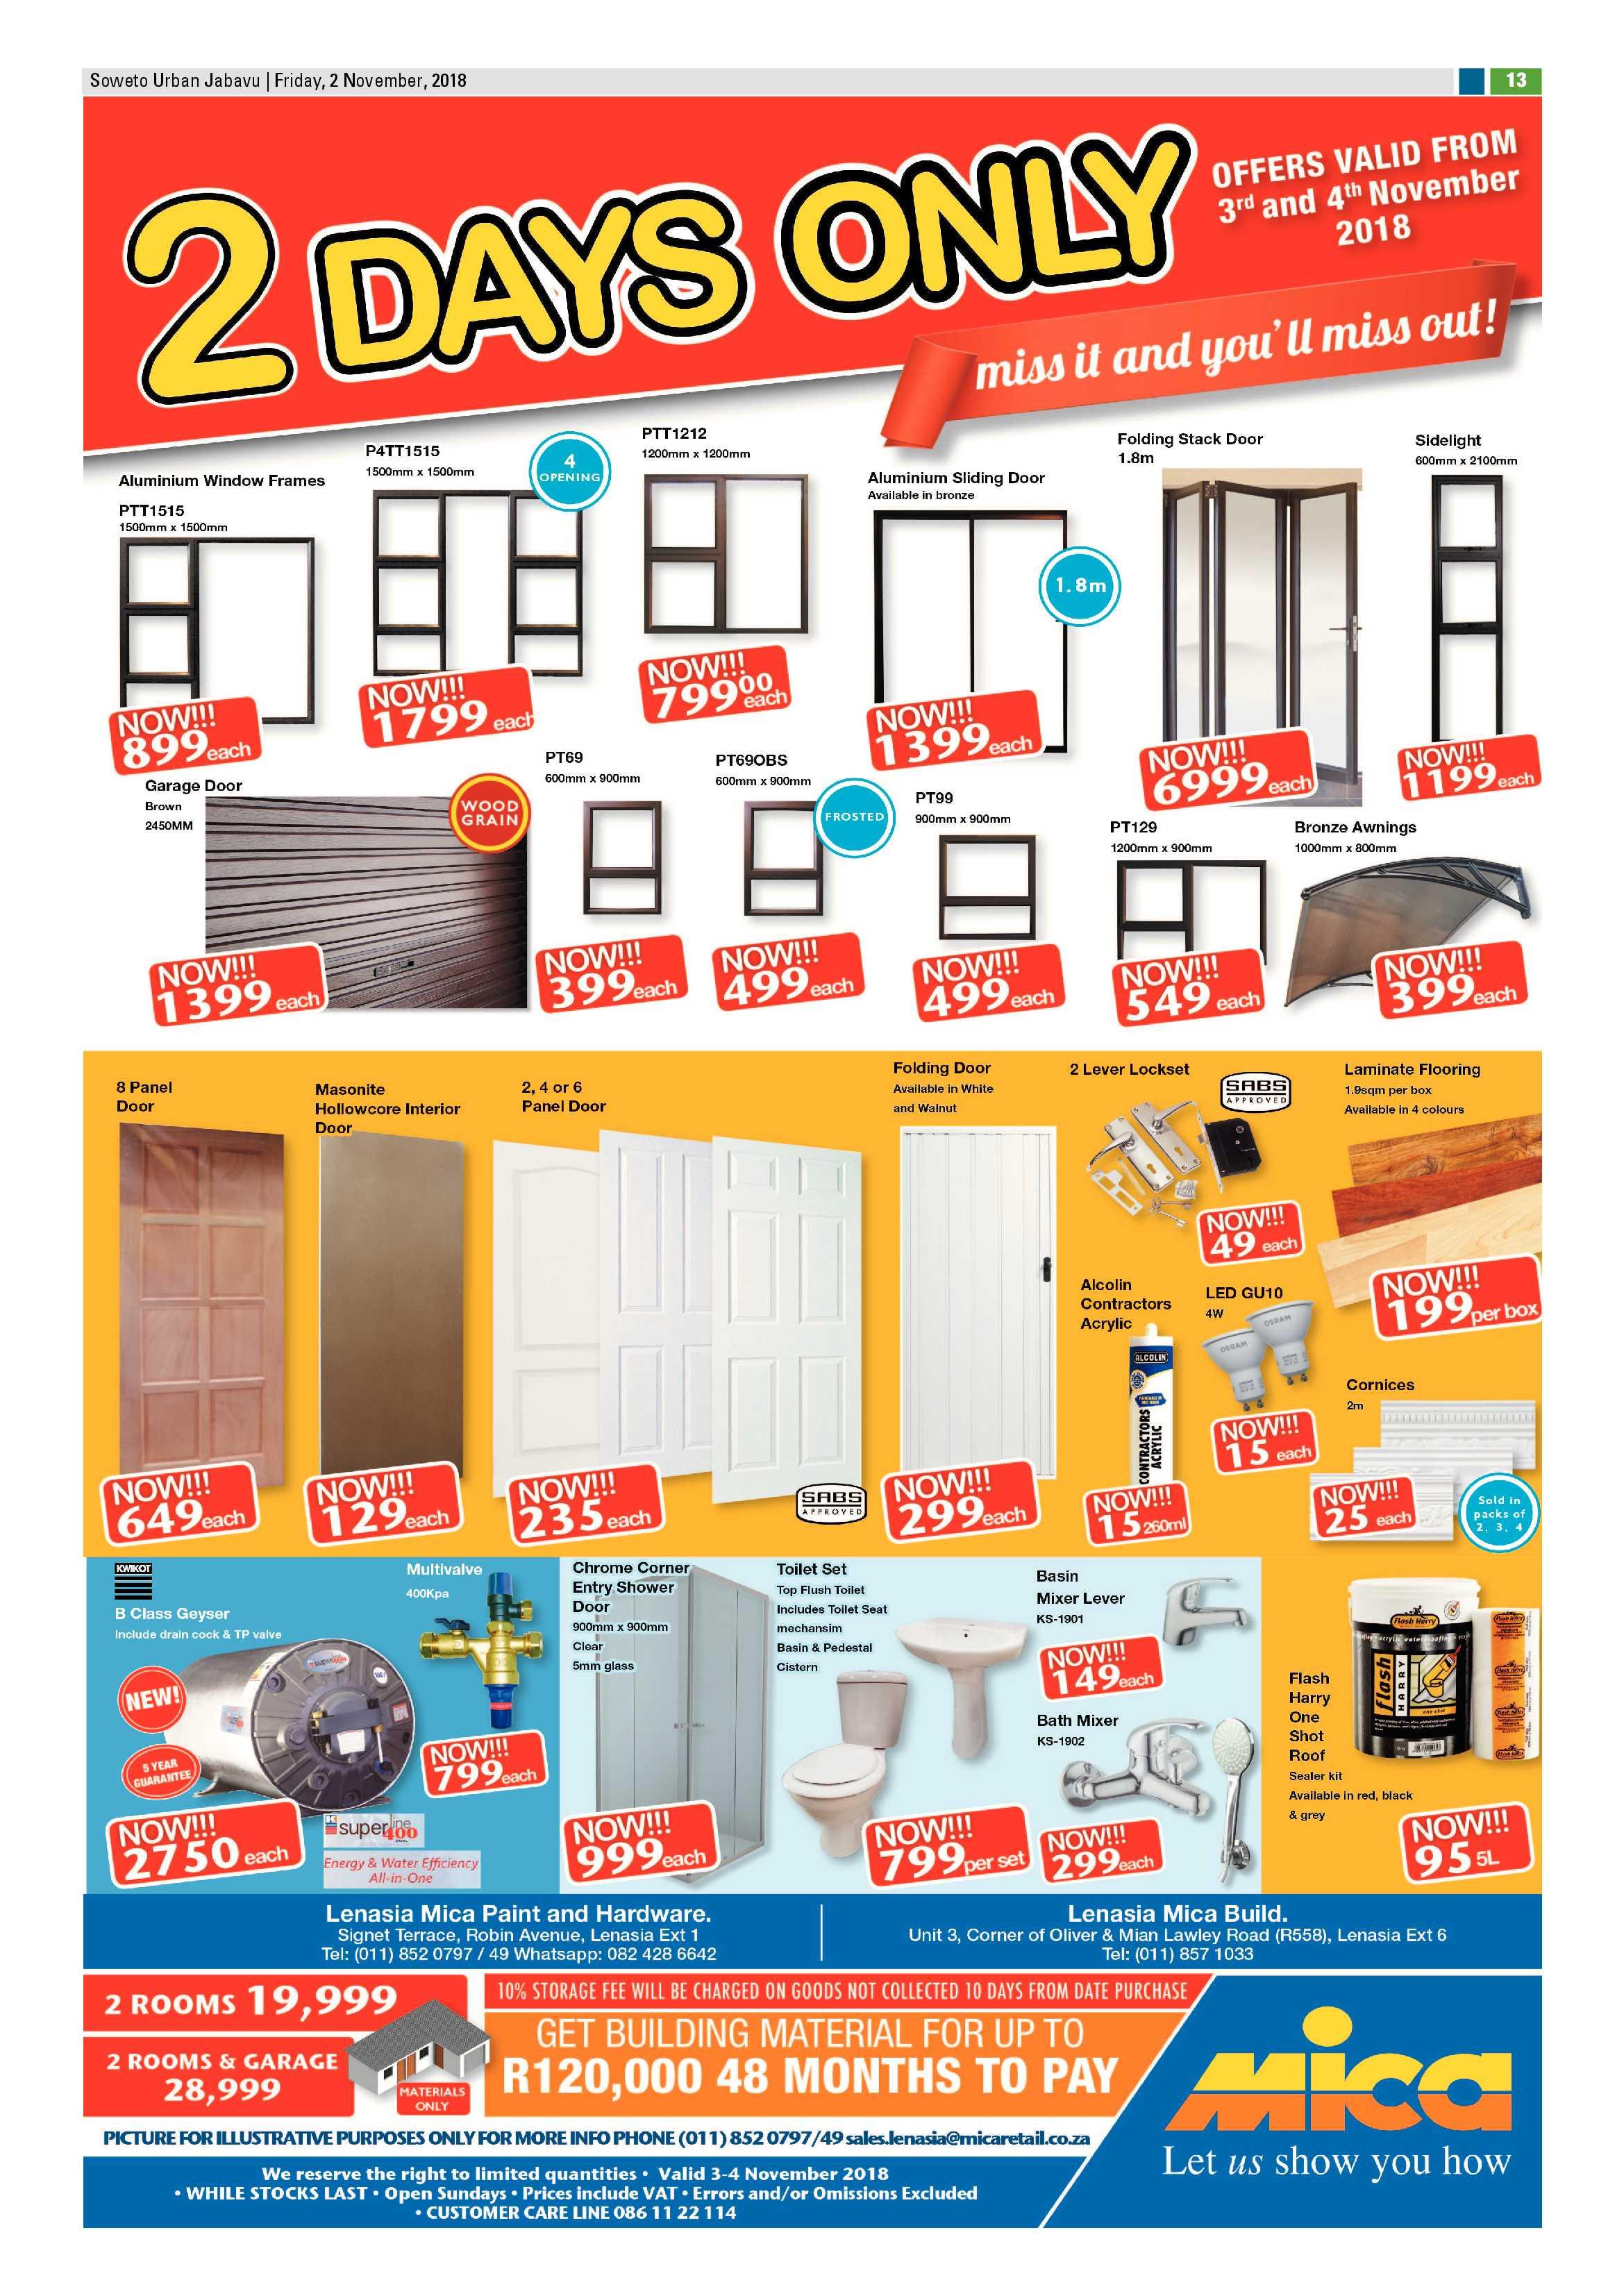 jabavu-november-2-2018-issue-epapers-page-13